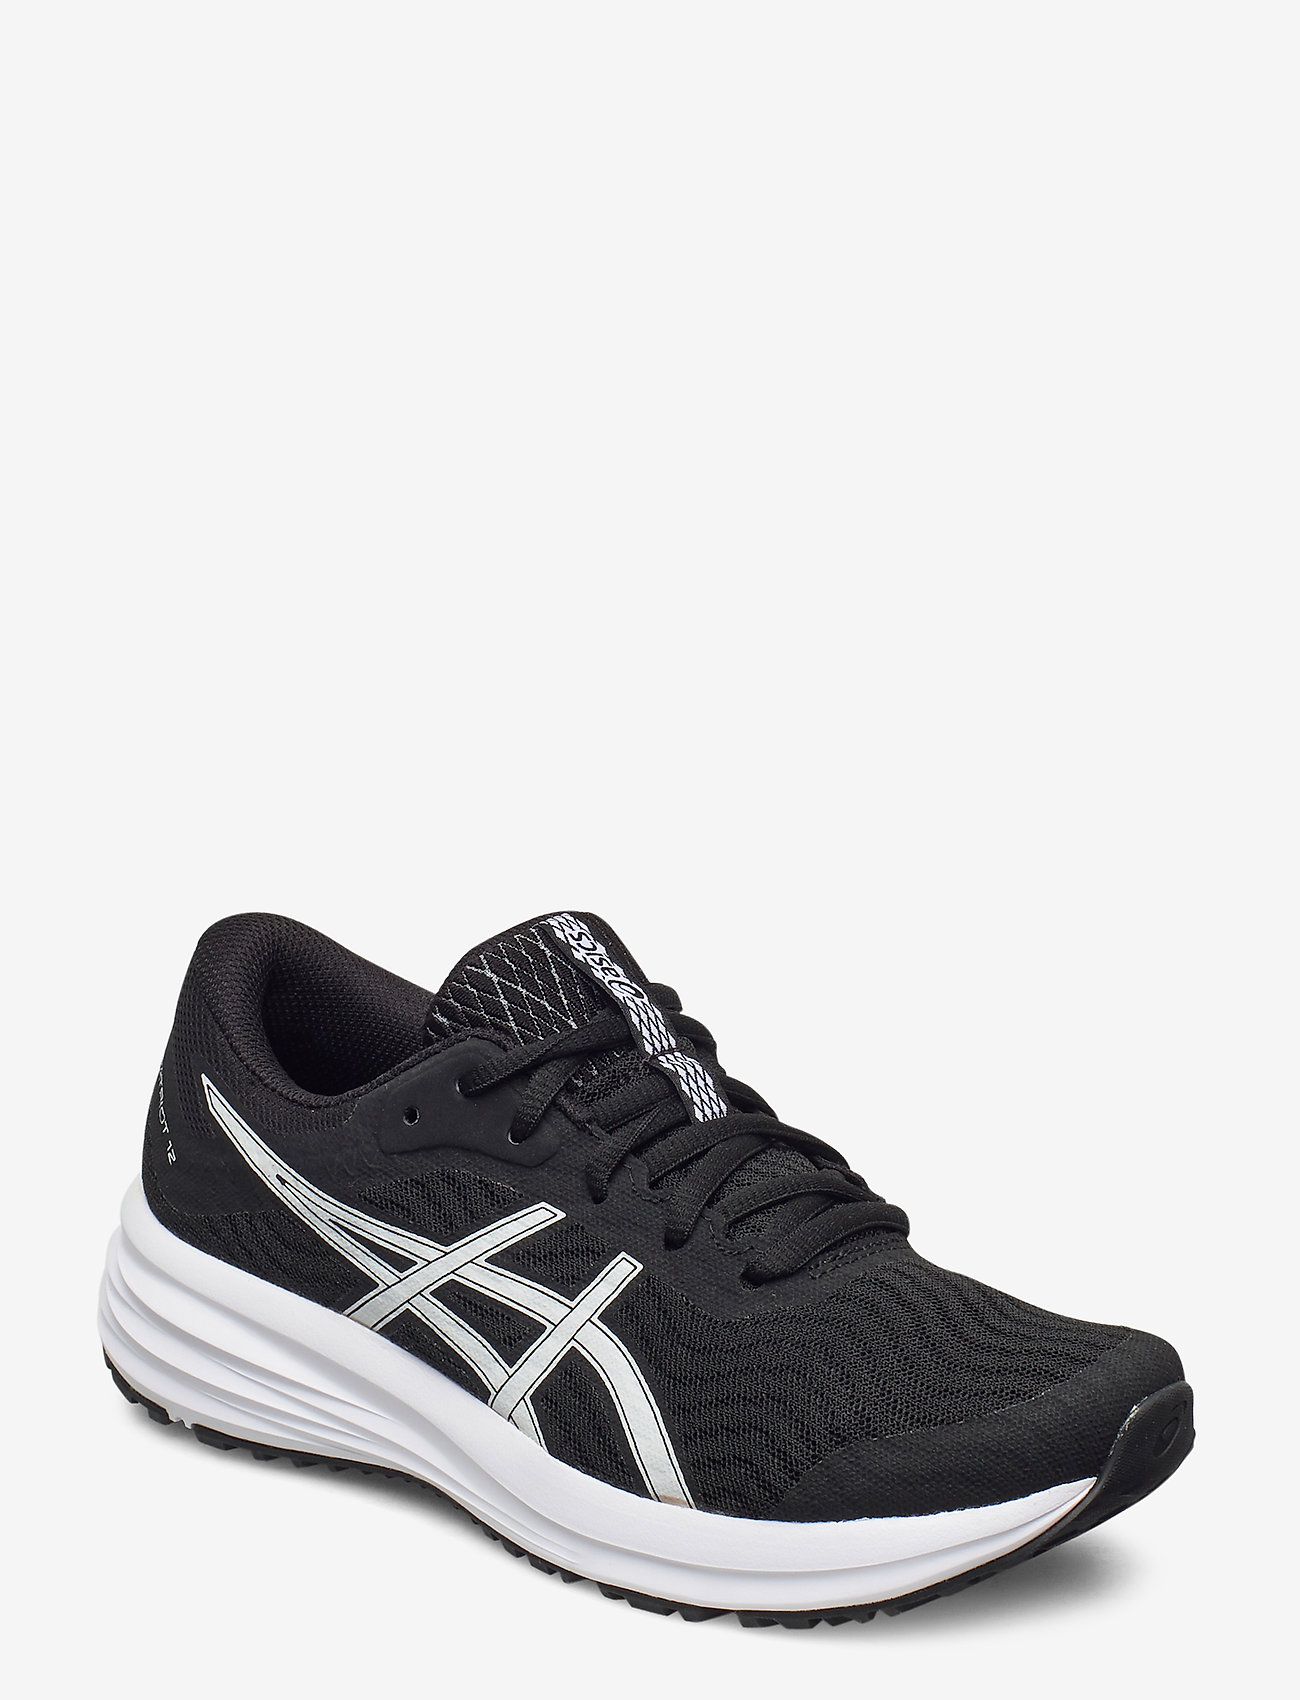 Asics - PATRIOT 12 - running shoes - black/white - 0